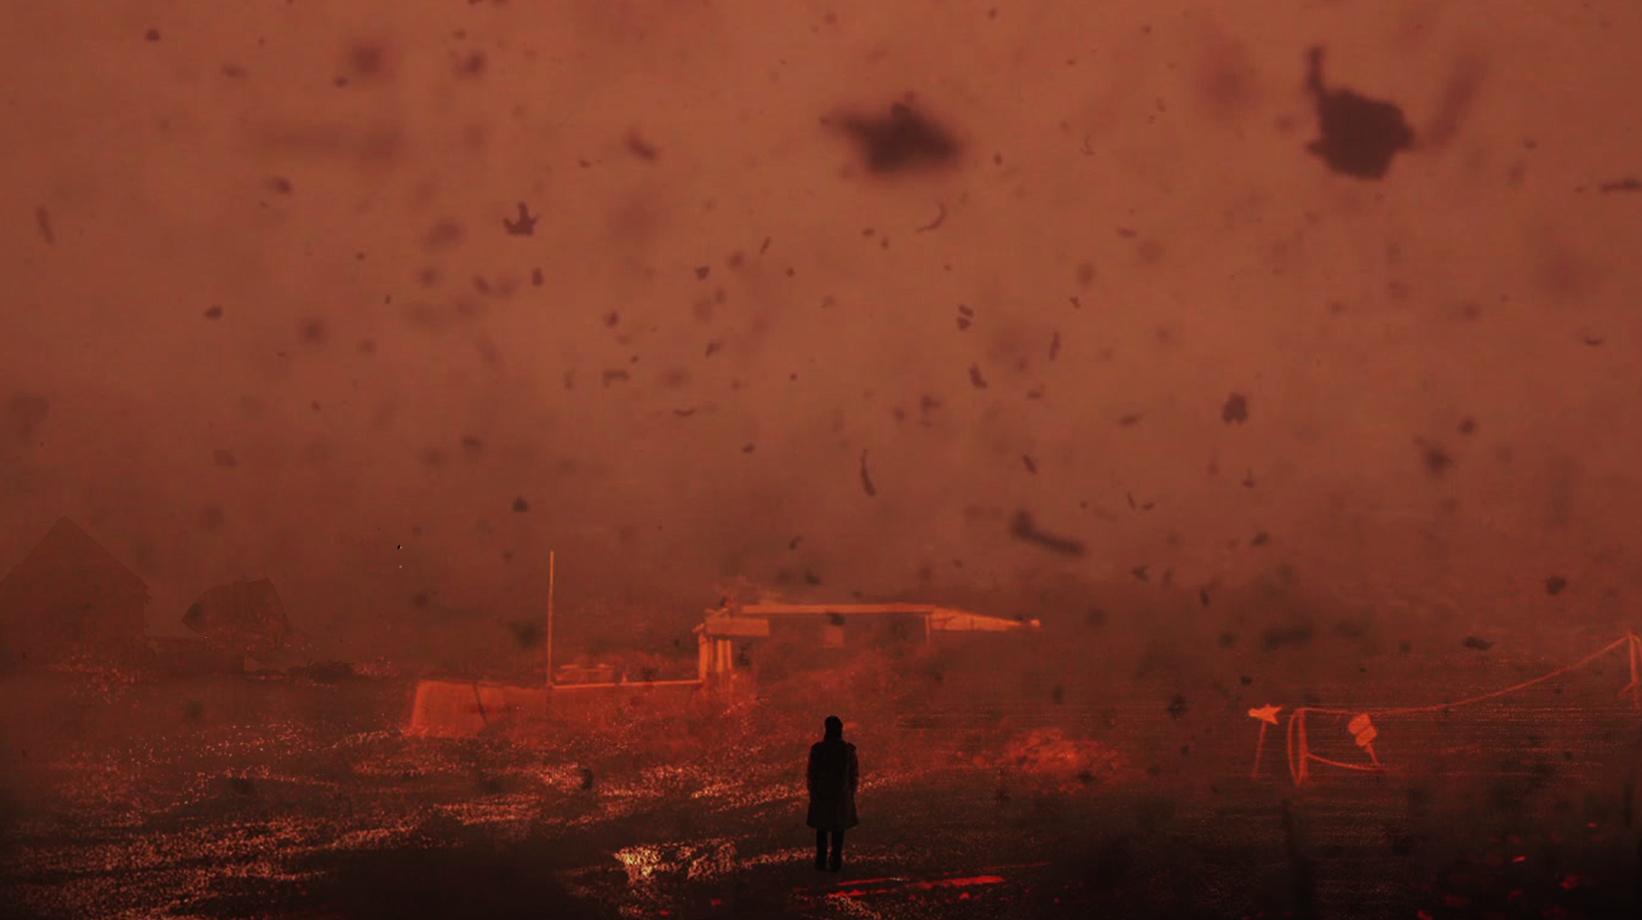 In silico, Court métrage de Léonard Barbier-Hourdin